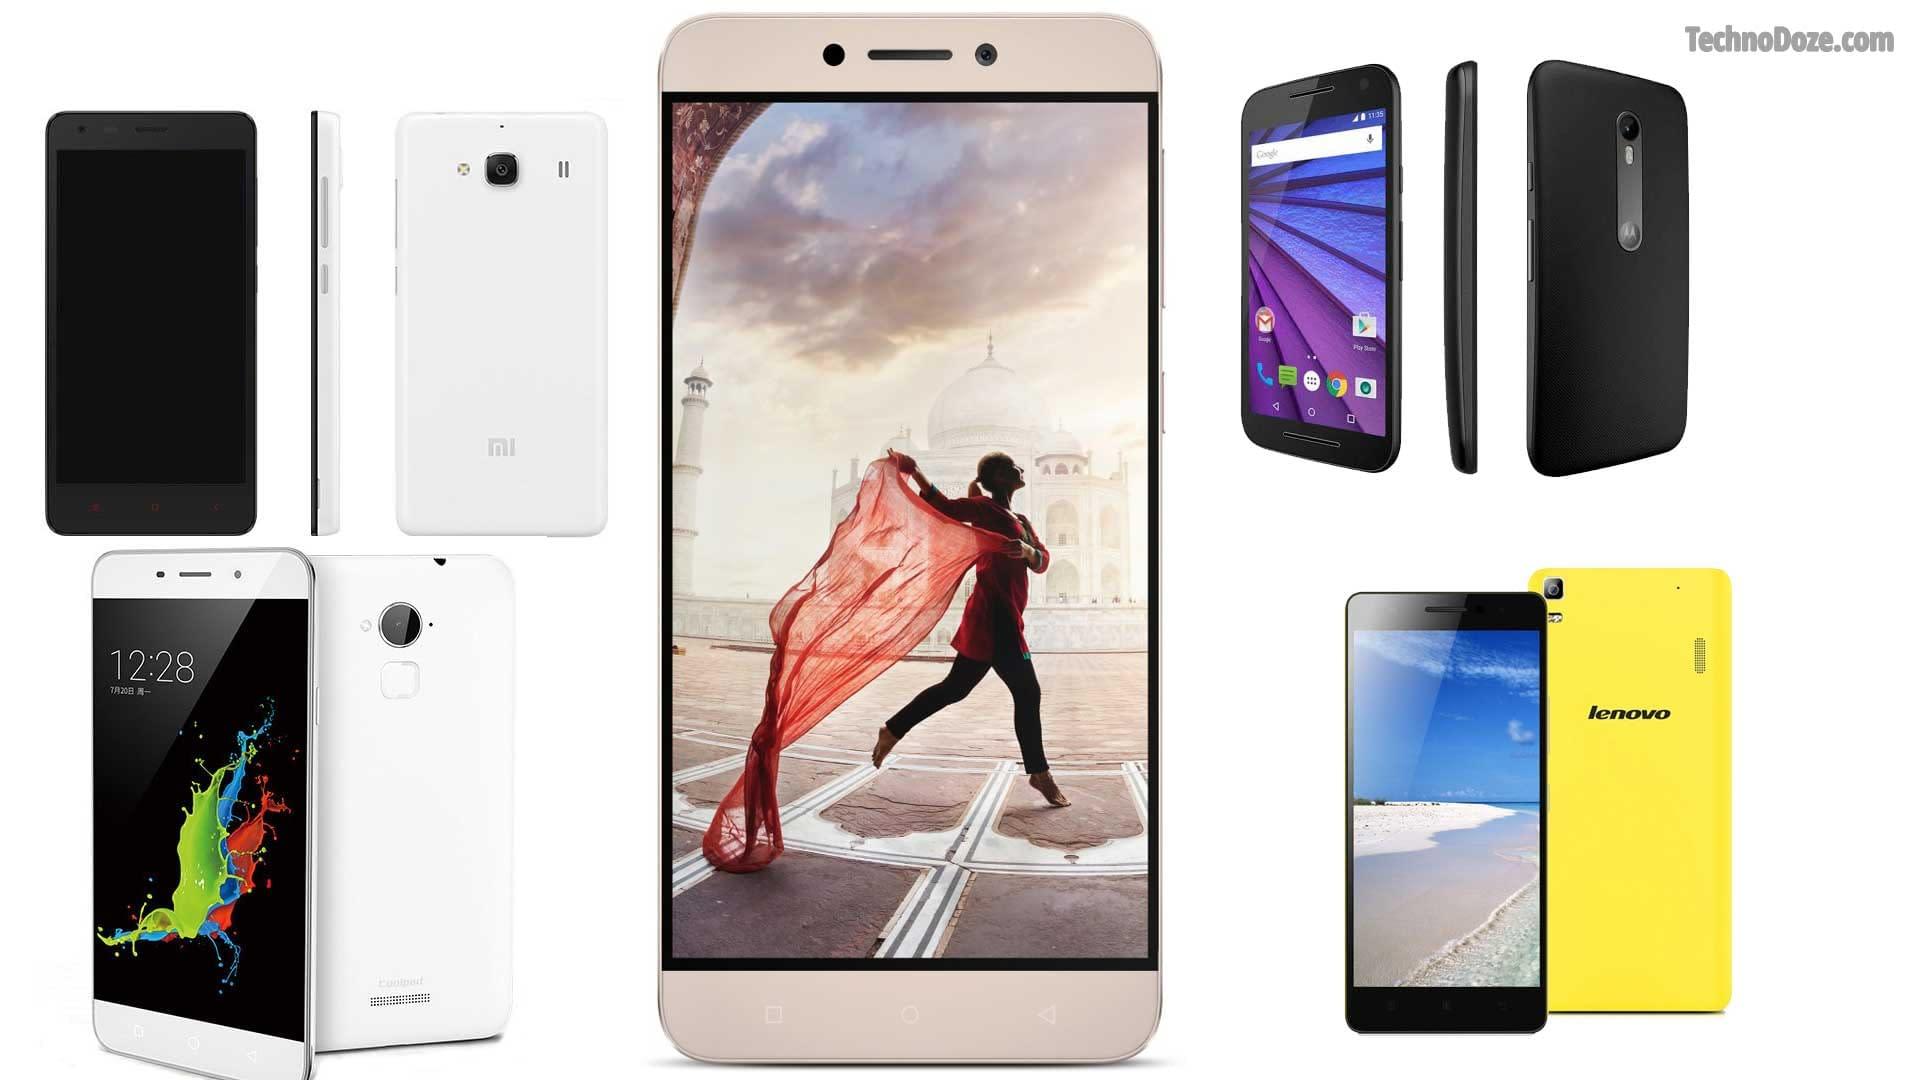 5 Smartphones Under 10000 Rs in India: 2016